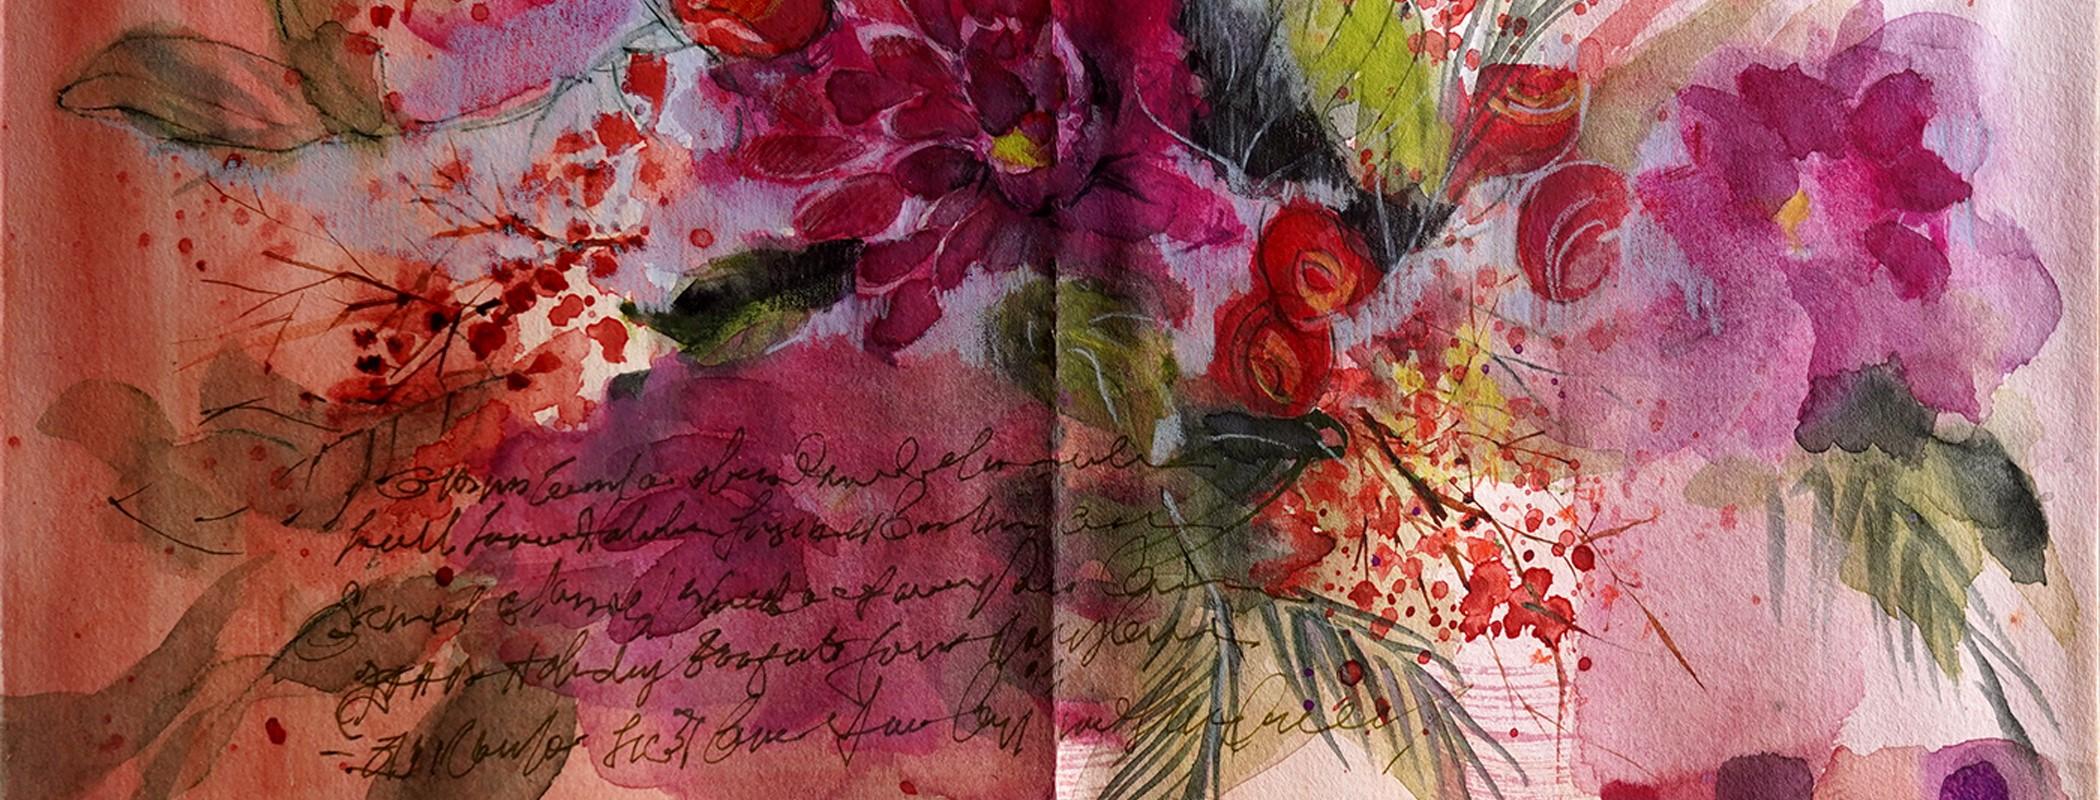 May Demo Artist - Pam Luer